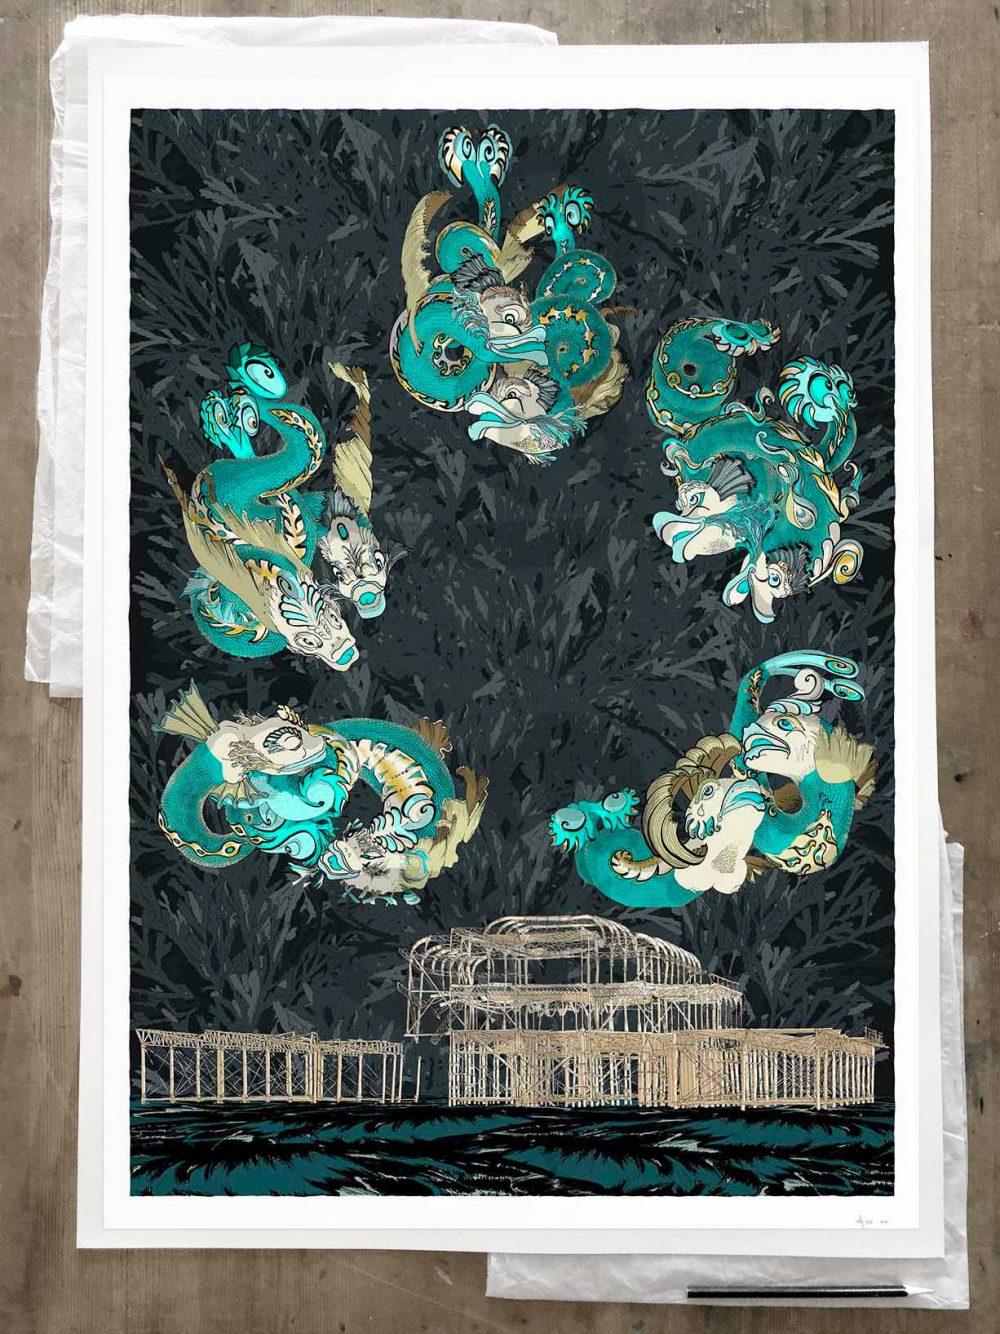 Fine art print by artist alej ez titled Dolphins of Brighton West Pier Midnight Sea